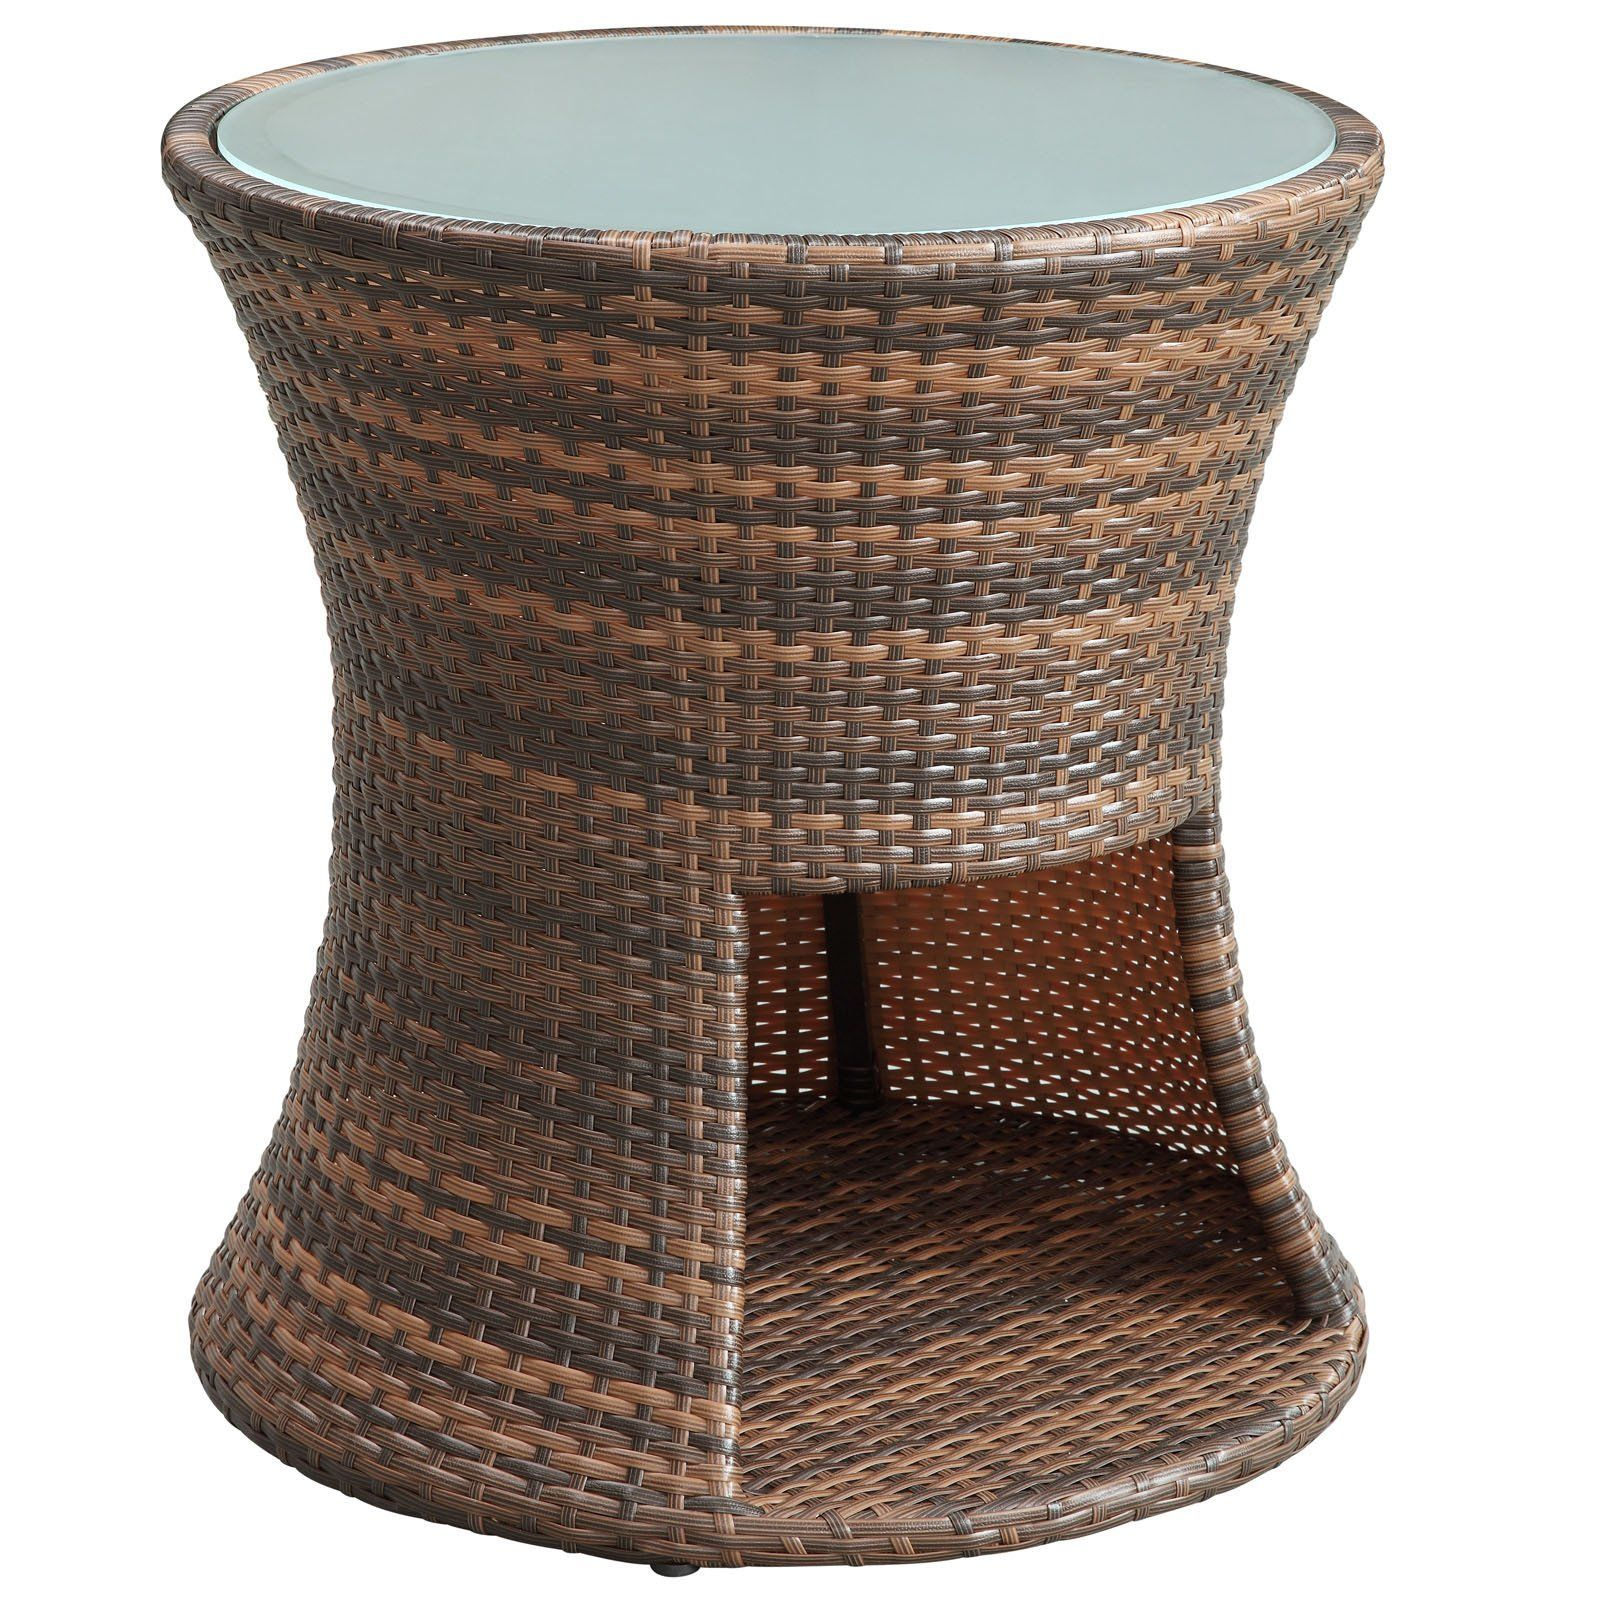 bd0d7603eb35ab3ef787aa5df32e1f97 Luxe De Salon Jardin Rotin Concept